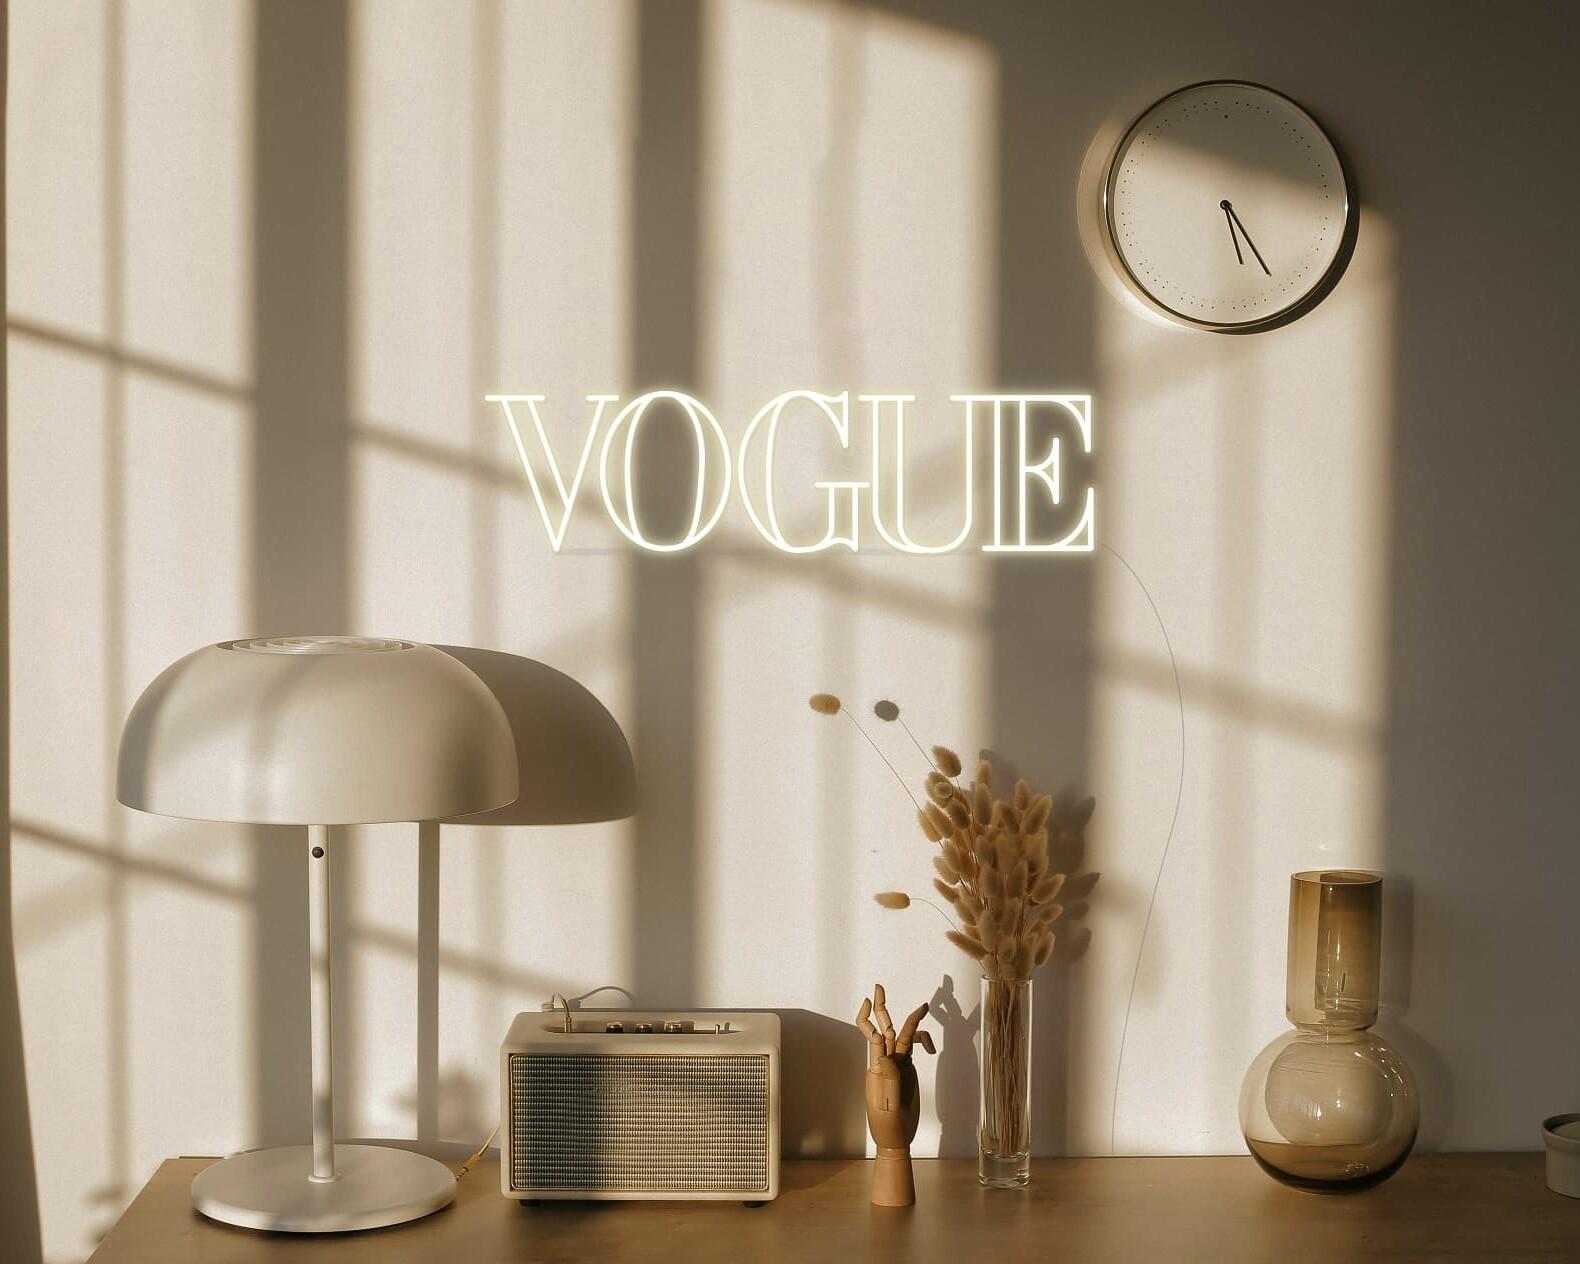 Vogue Neon Sign